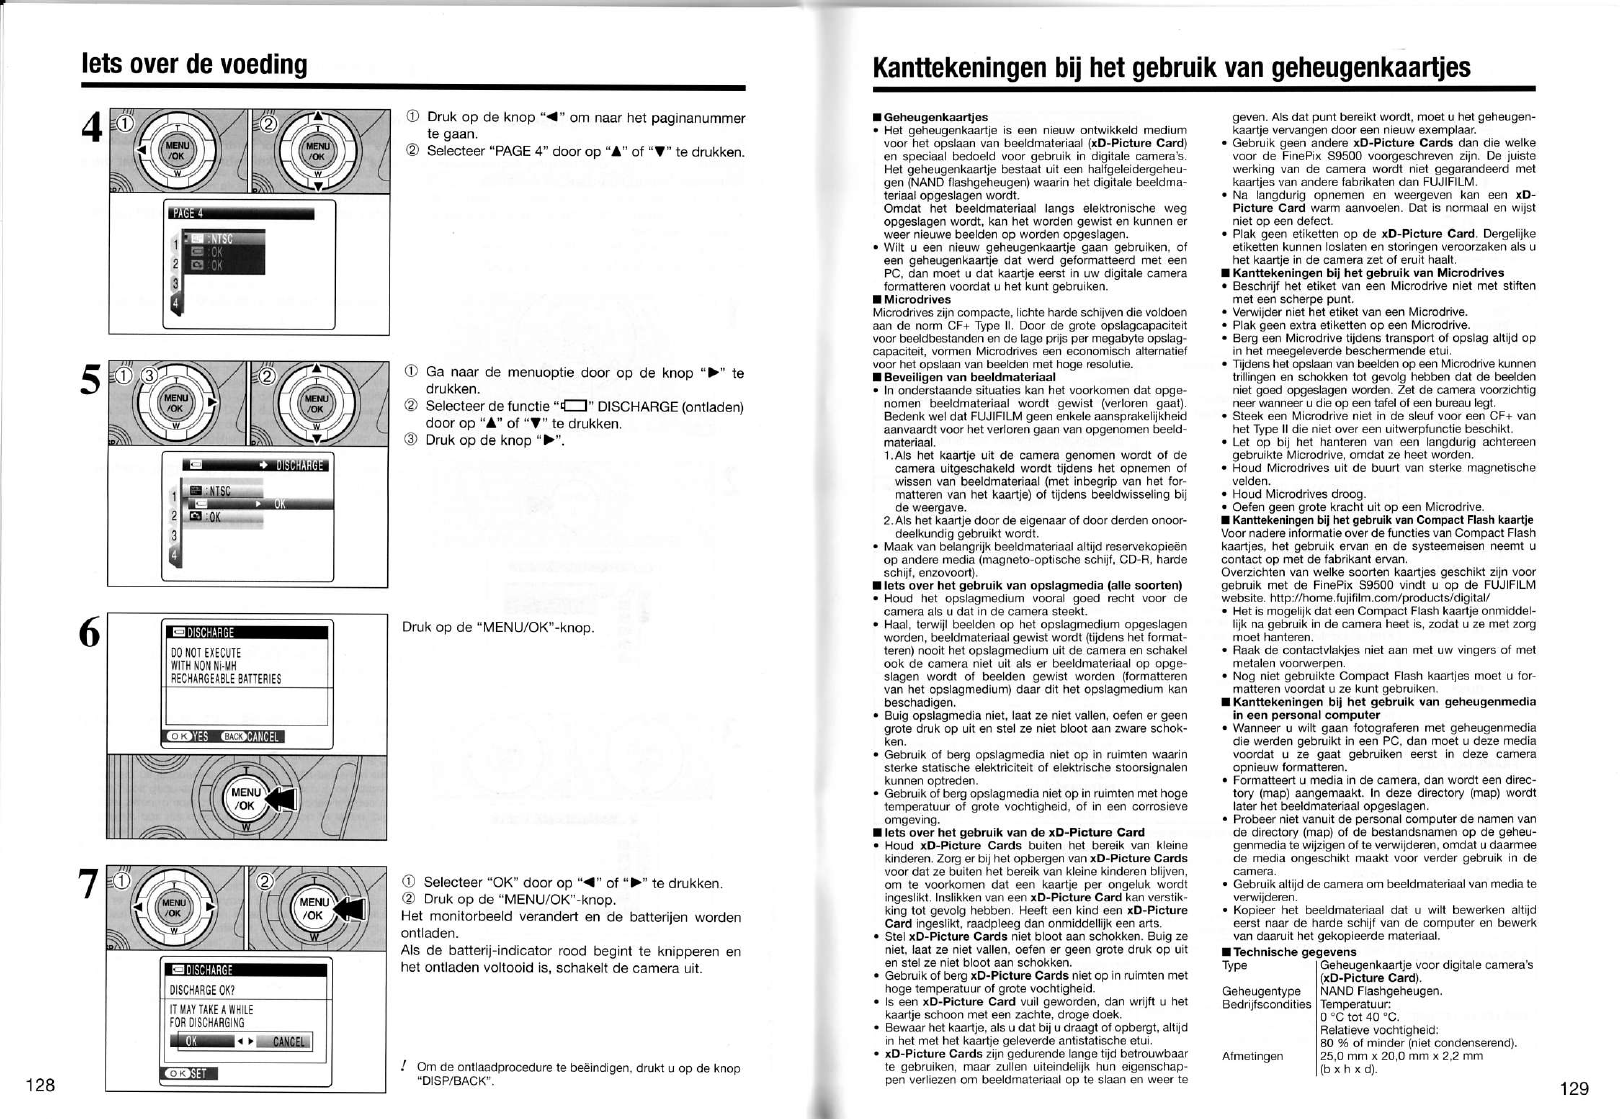 Handleiding Fujifilm Finepix S9600  Pagina 64 Van 68   Nederlands